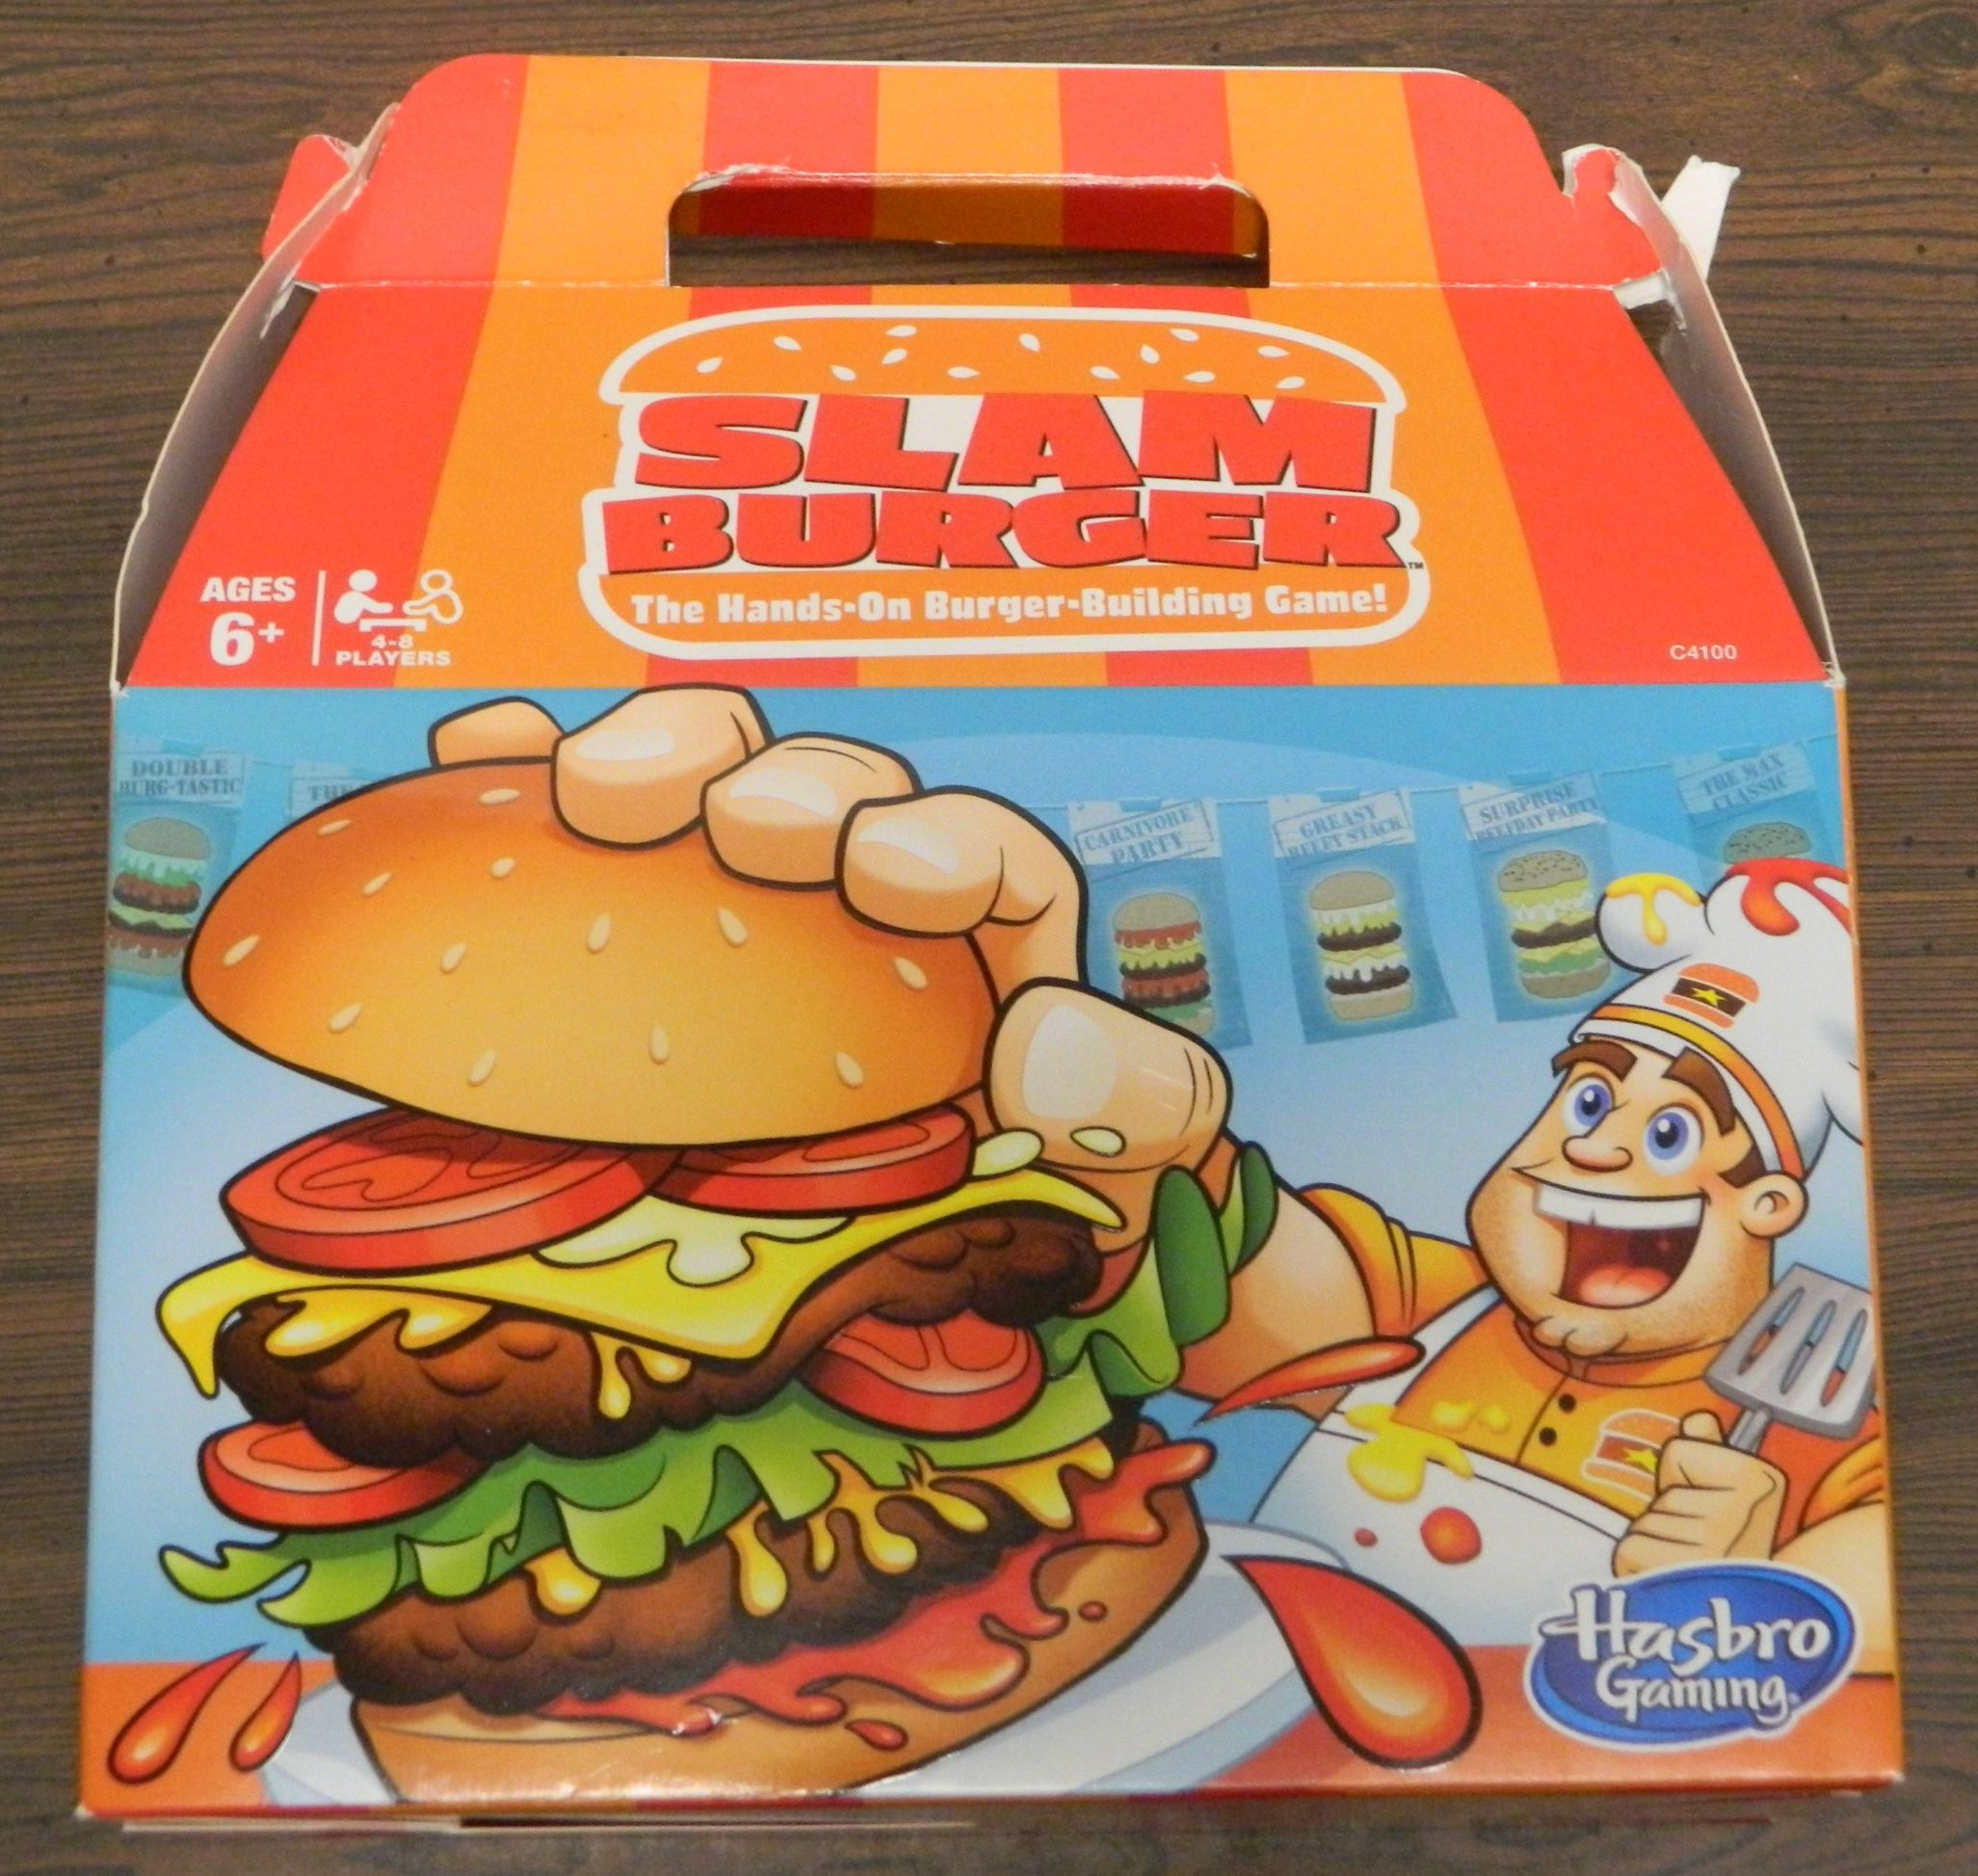 Box for Slam Burger